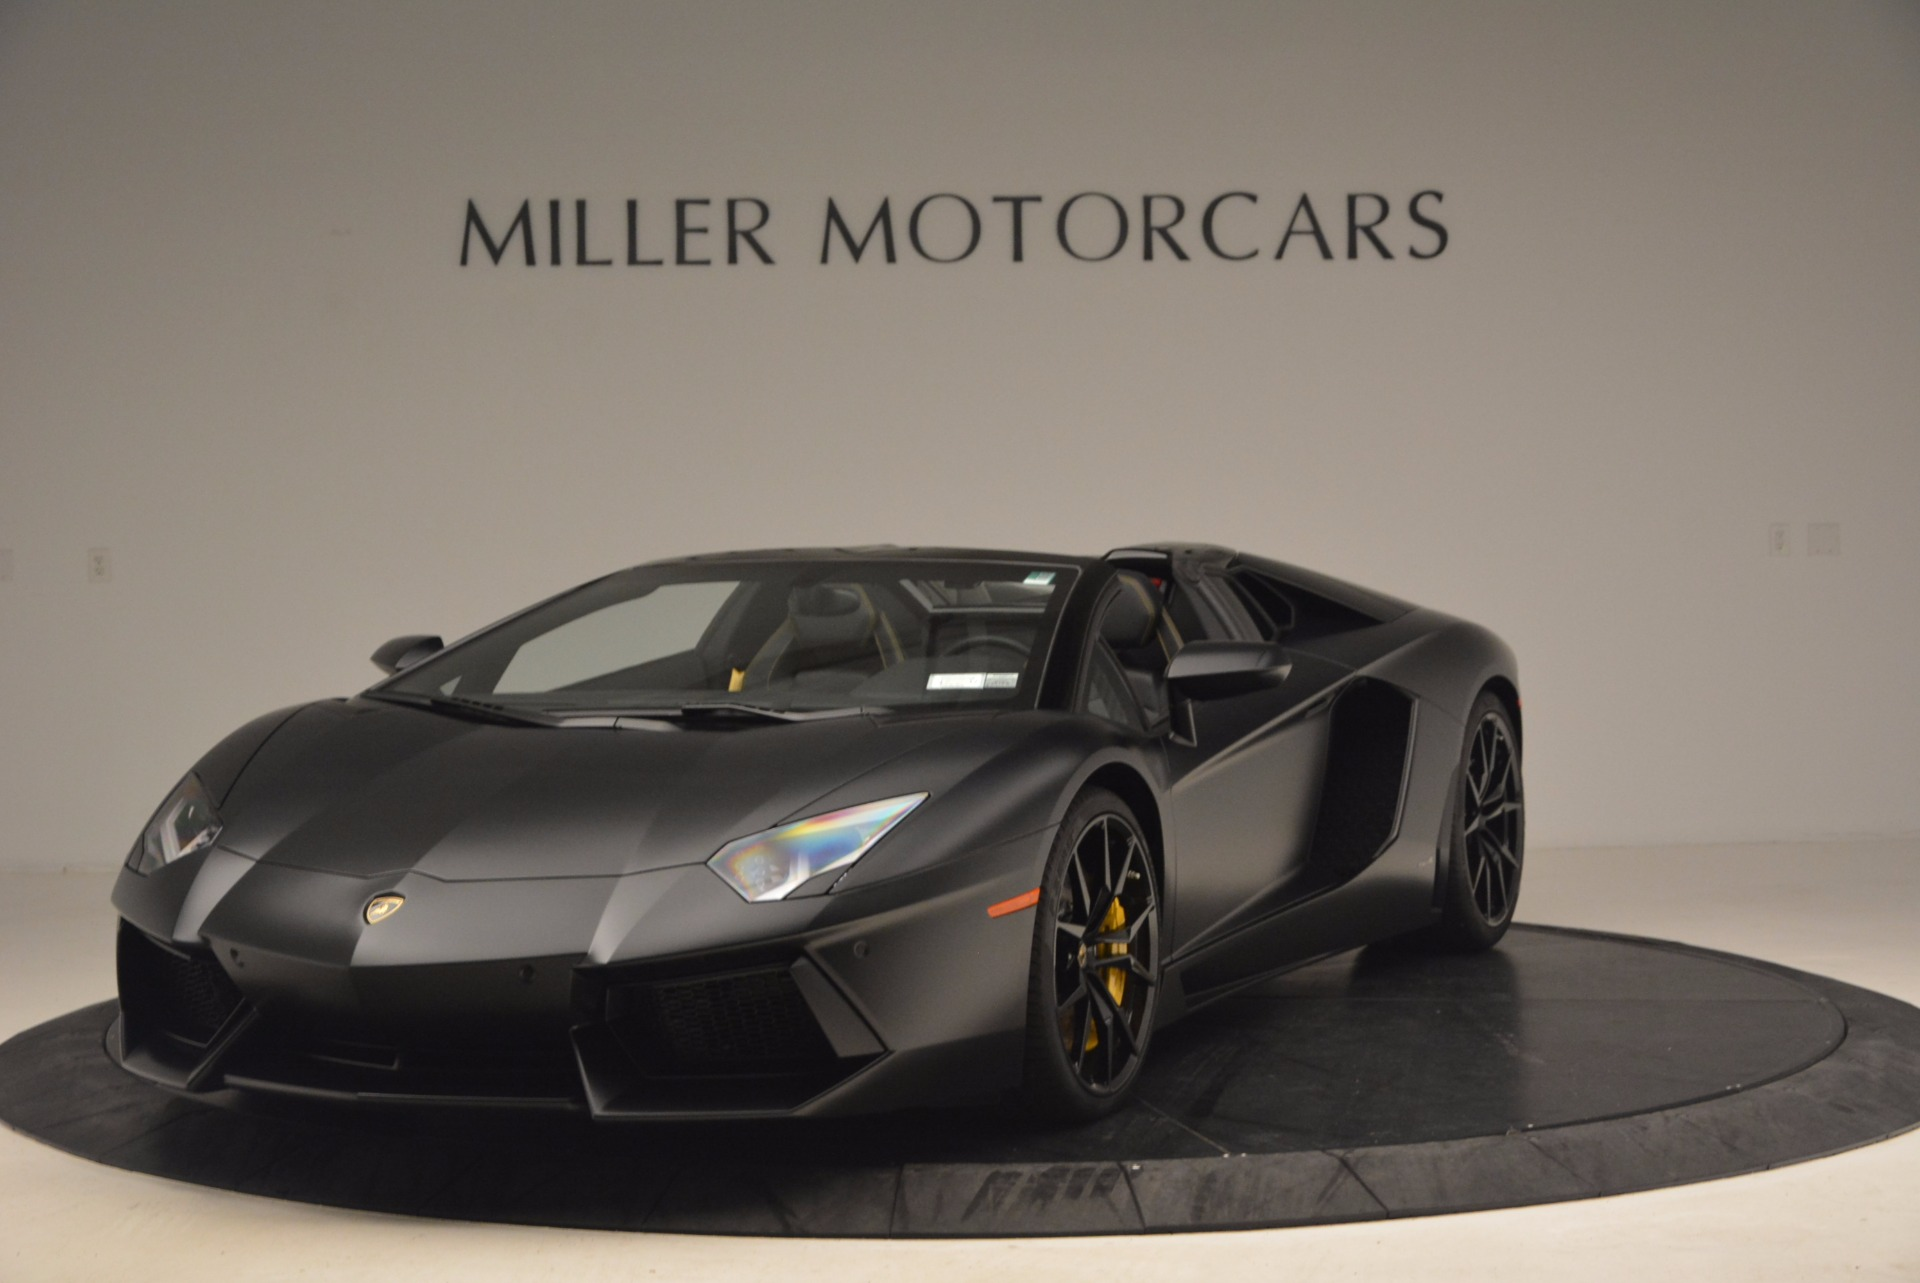 Used 2015 Lamborghini Aventador LP 700-4 for sale Sold at Aston Martin of Greenwich in Greenwich CT 06830 1